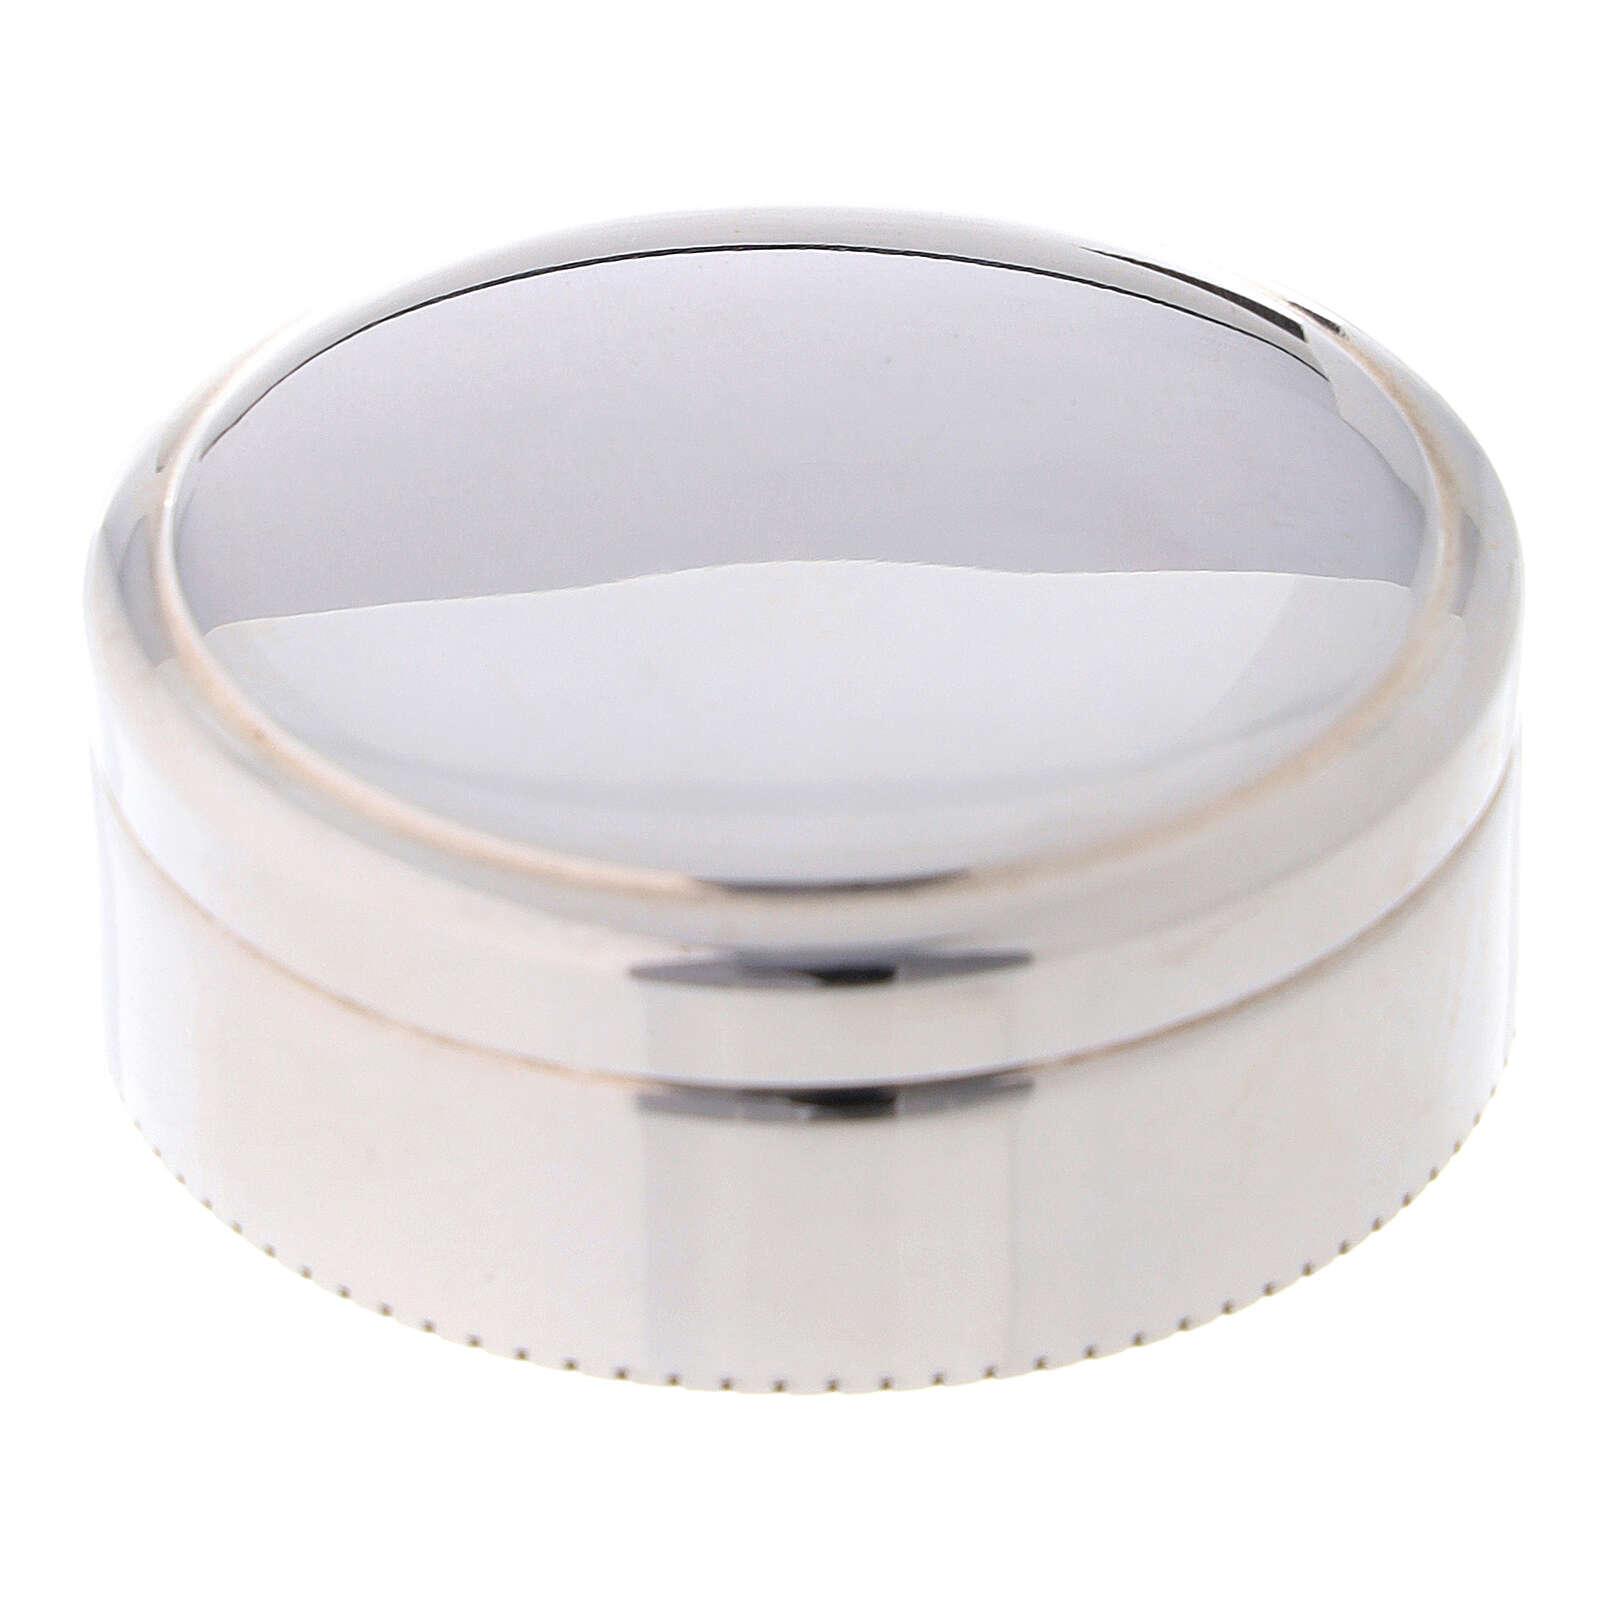 Portarosario tondo in argento 925 liscio 4